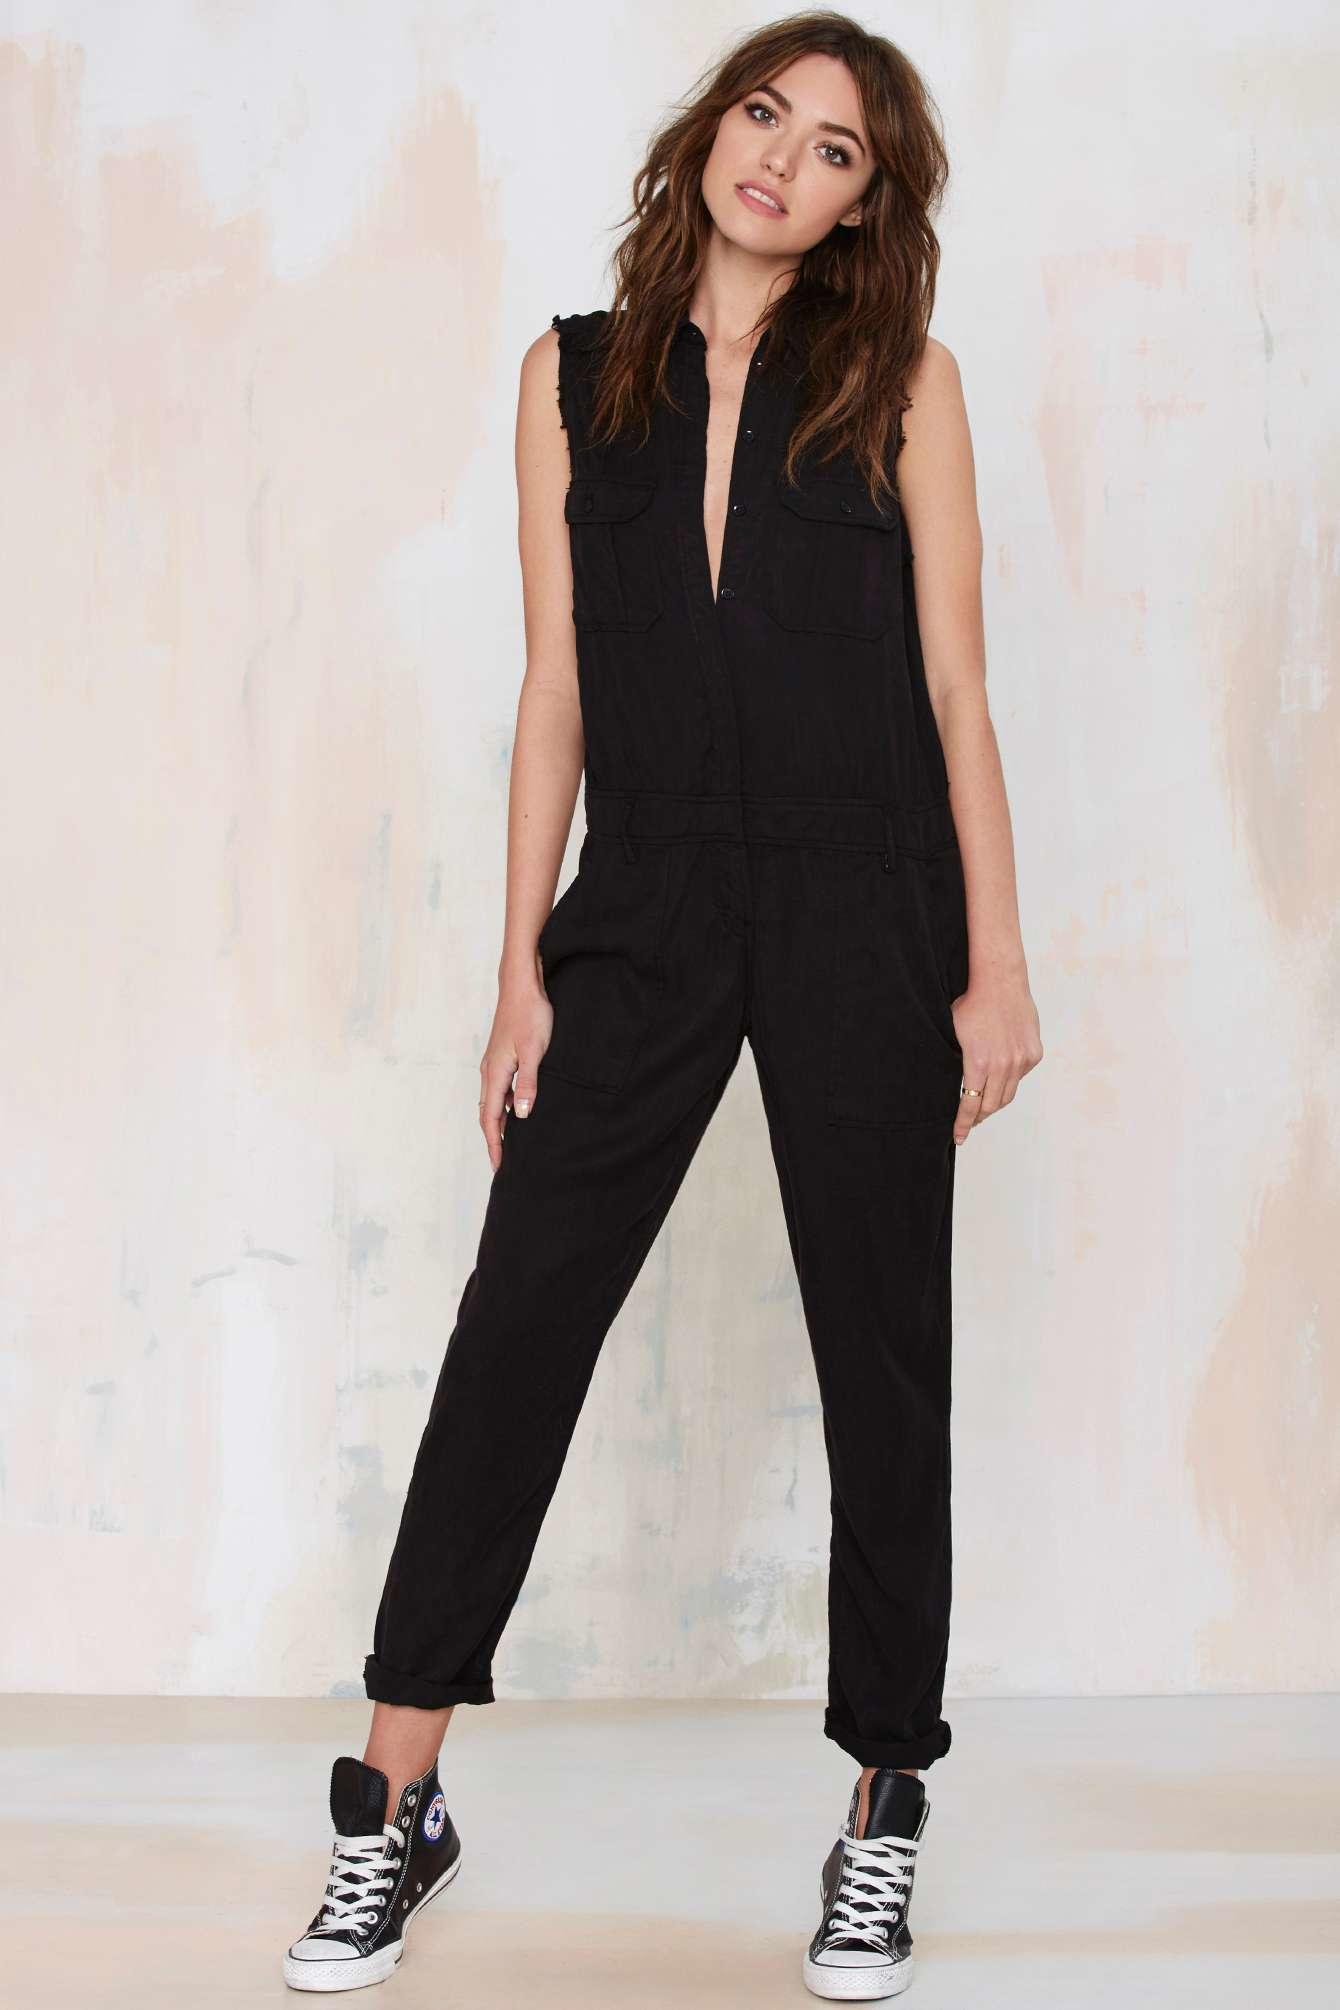 Etienne marcel Cut Loose Sleeveless Utility Jumpsuit in Black | Lyst